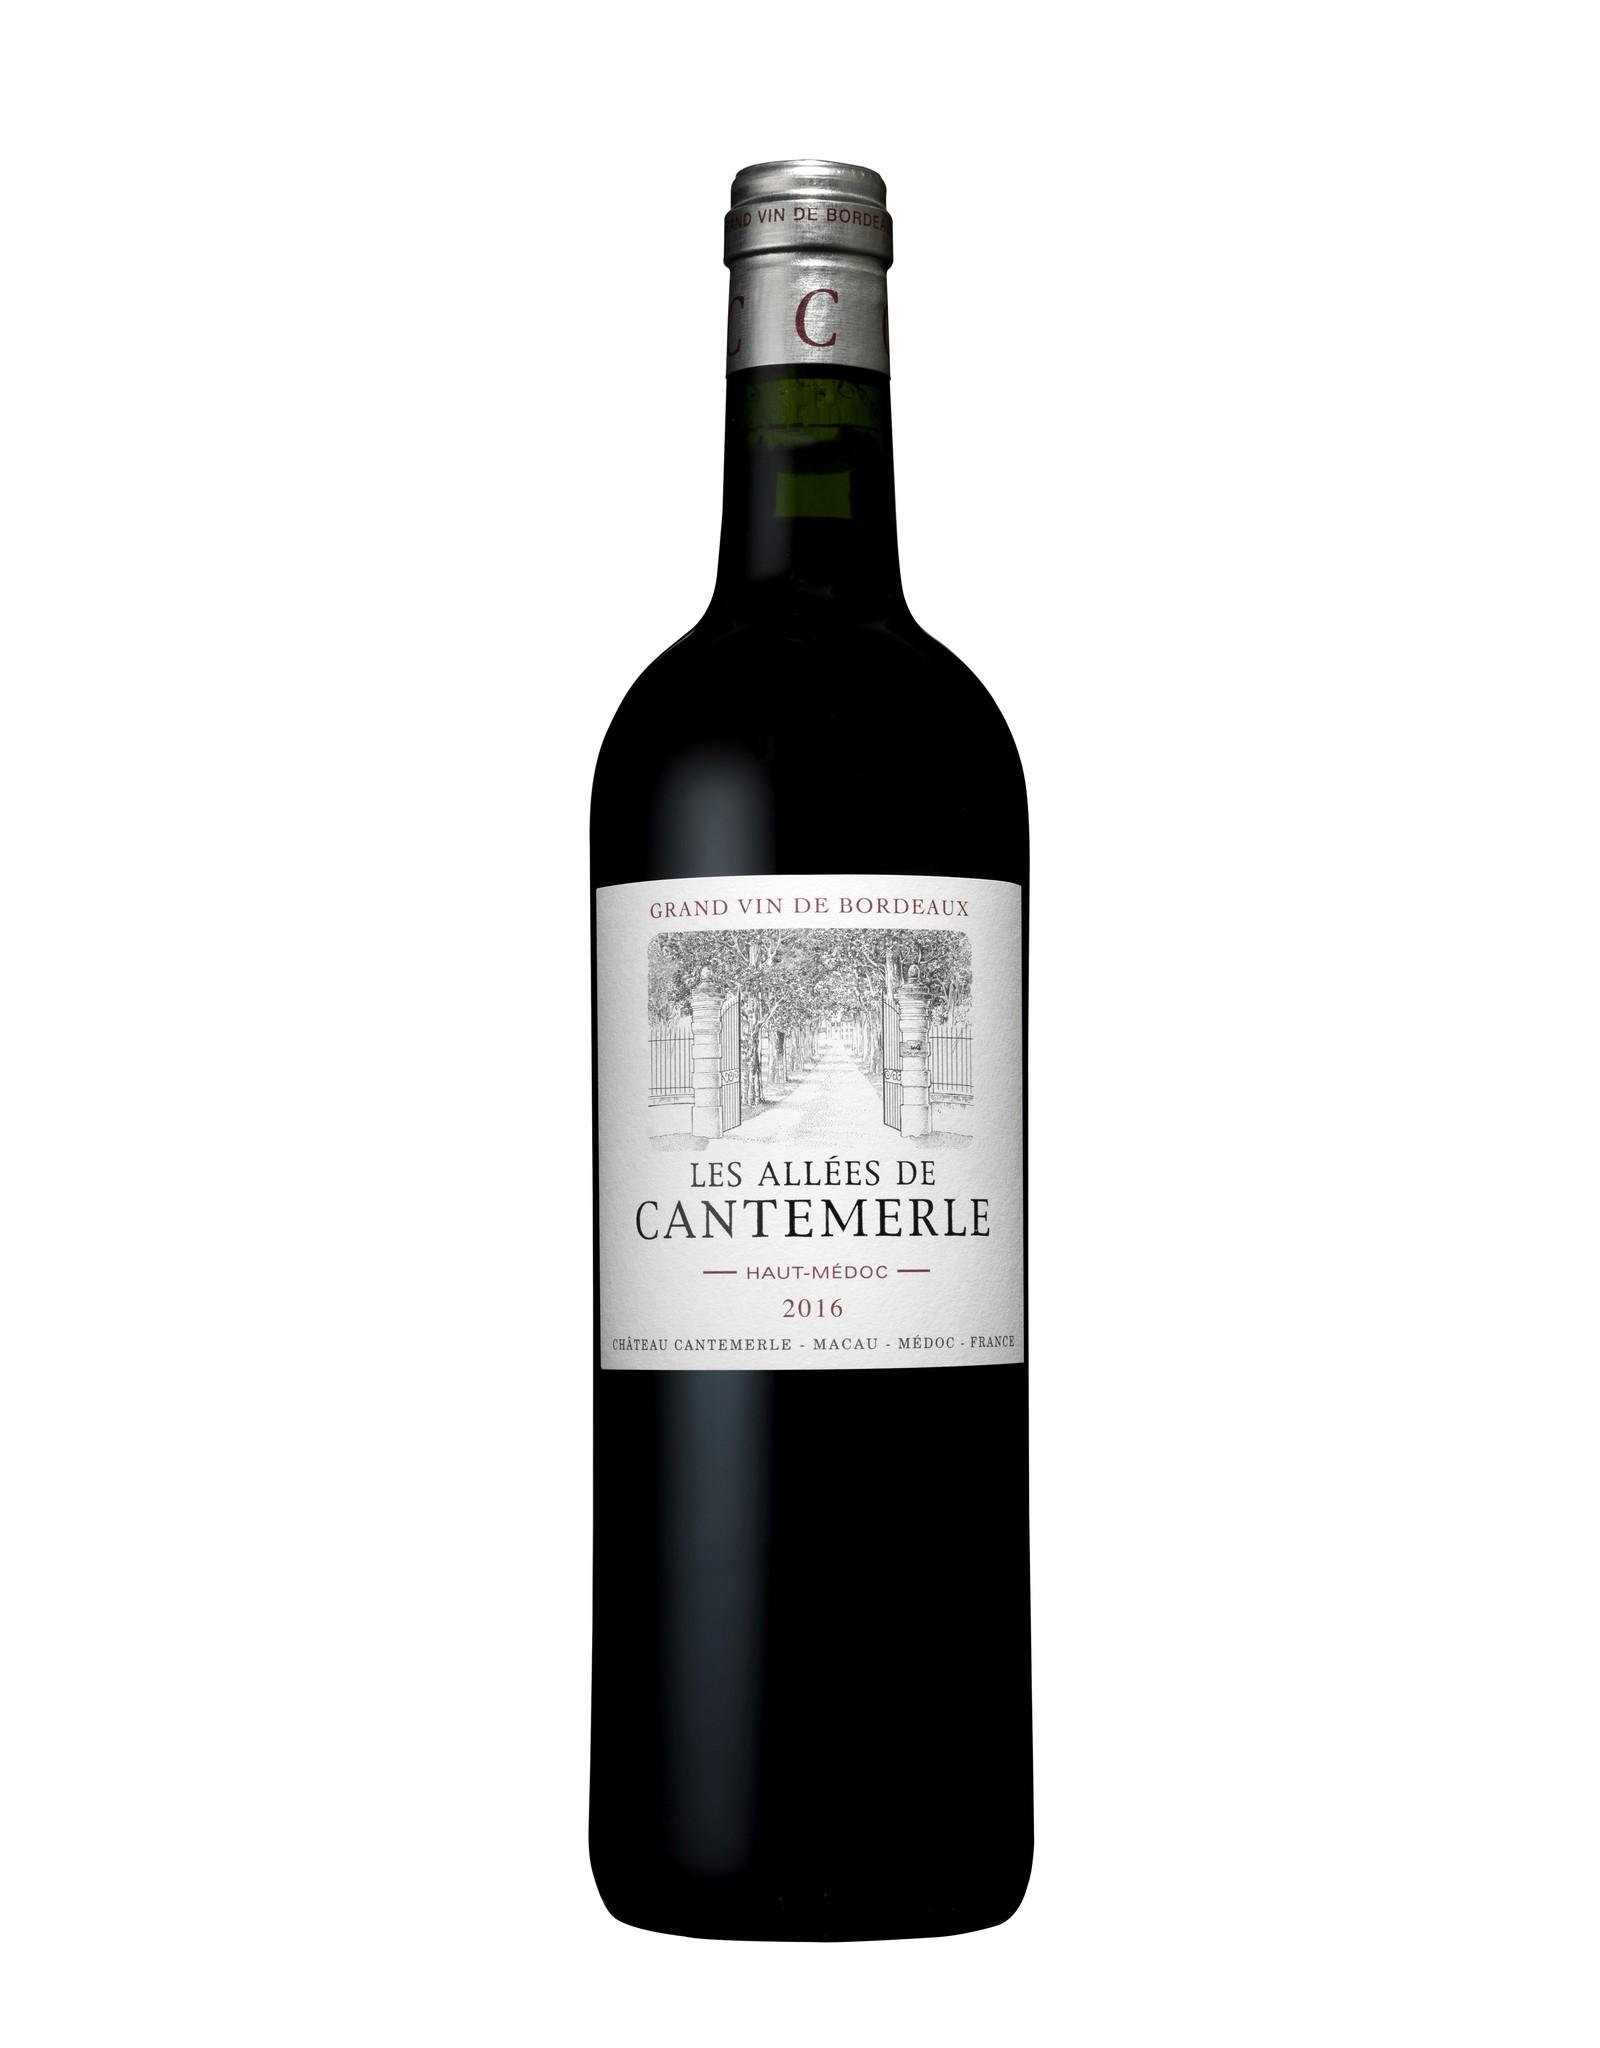 Château Cantemerle Château Cantemerle 2014 - Haut-Médoc